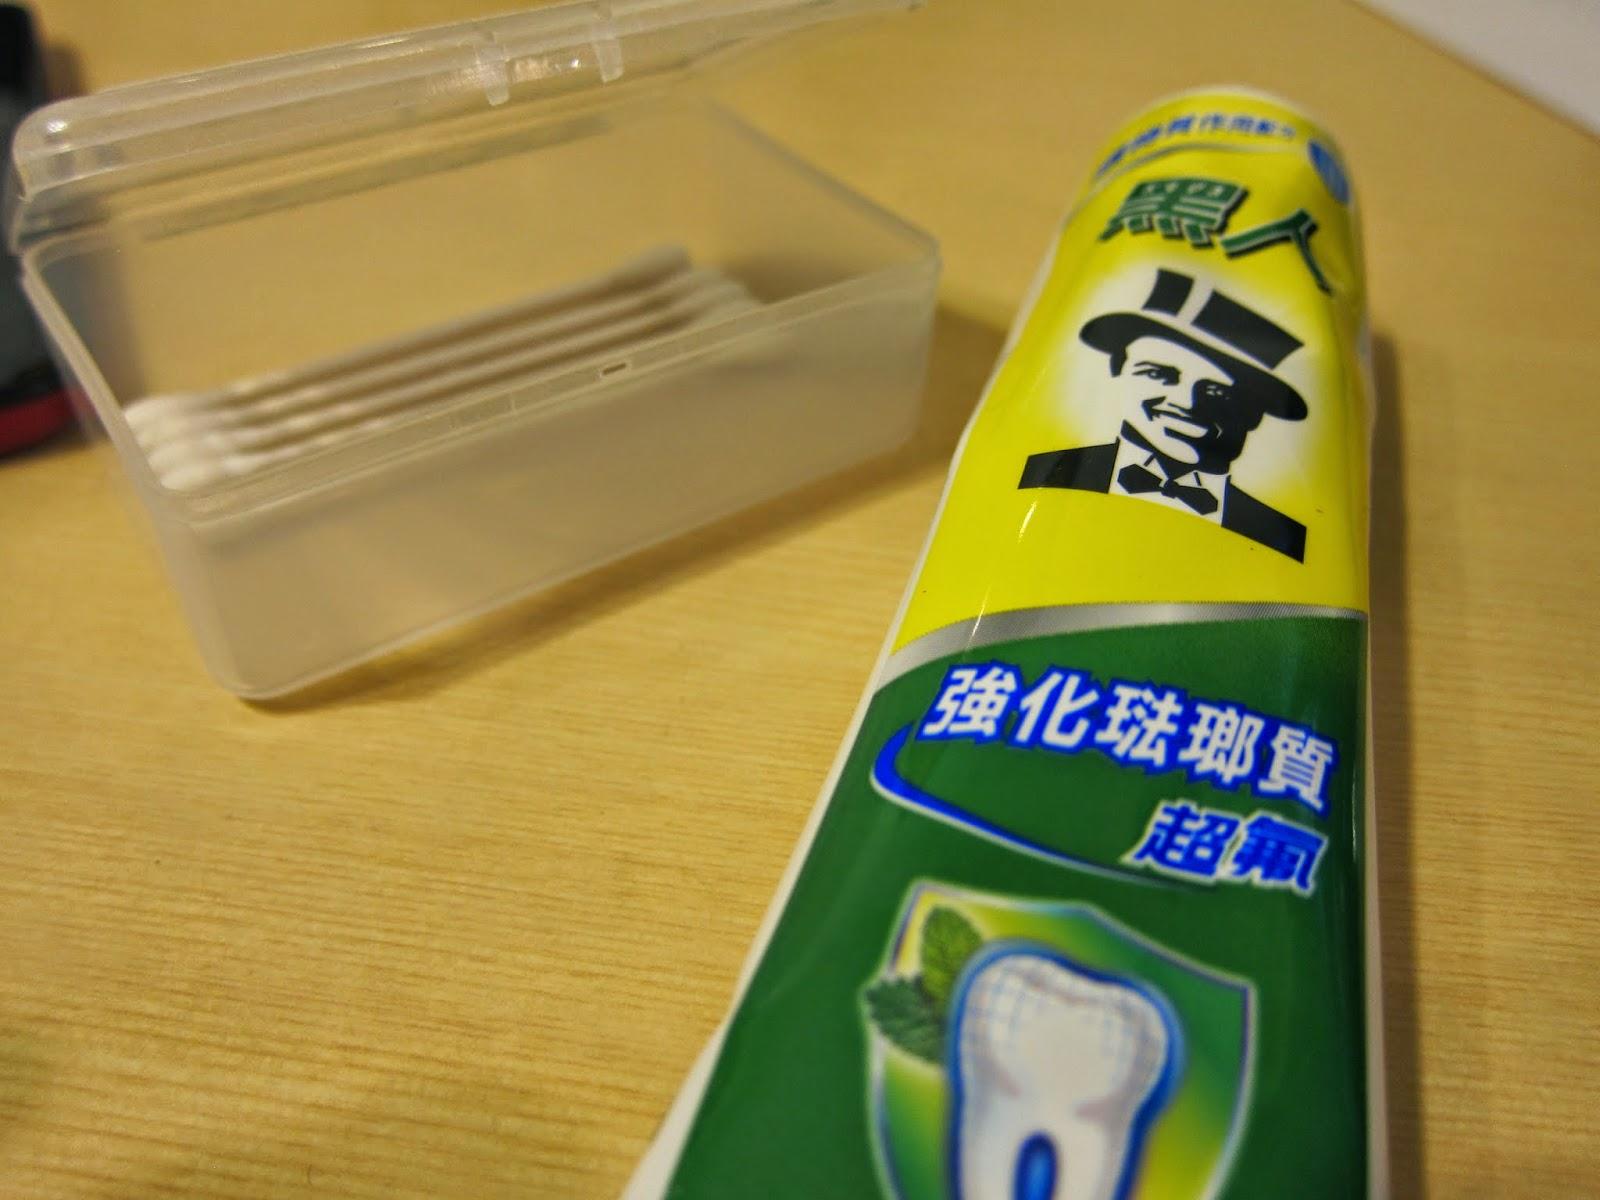 IMG 2375 - [實驗] 手機刮傷、痕跡,抹牙膏真的有效嗎?